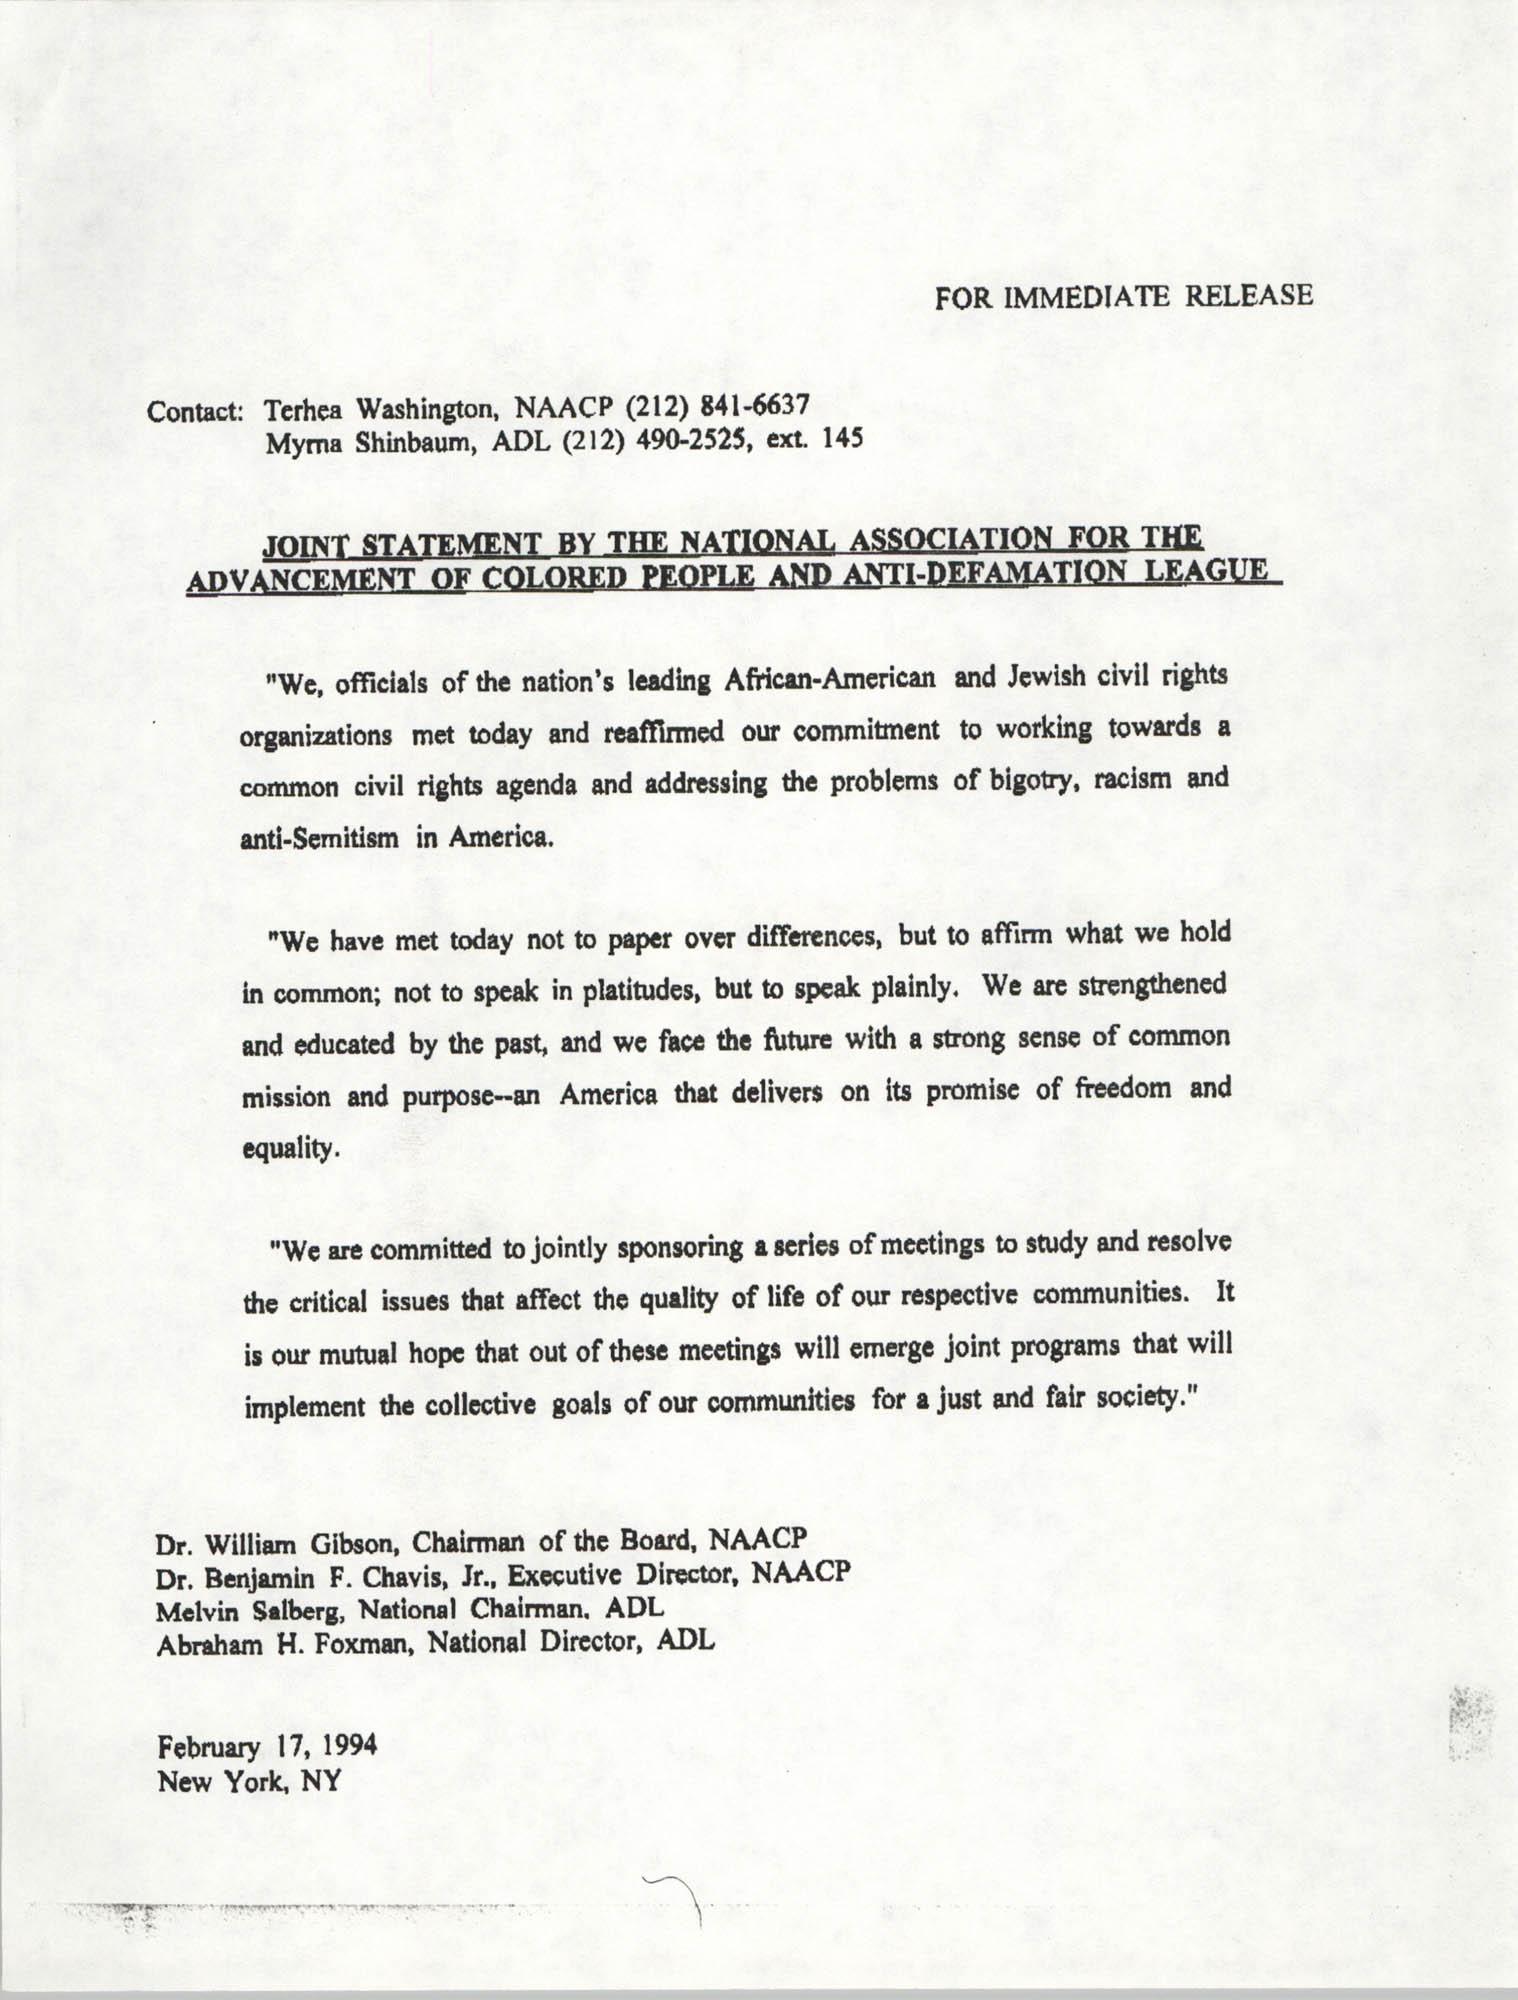 NAACP Press Release, February 17, 1994